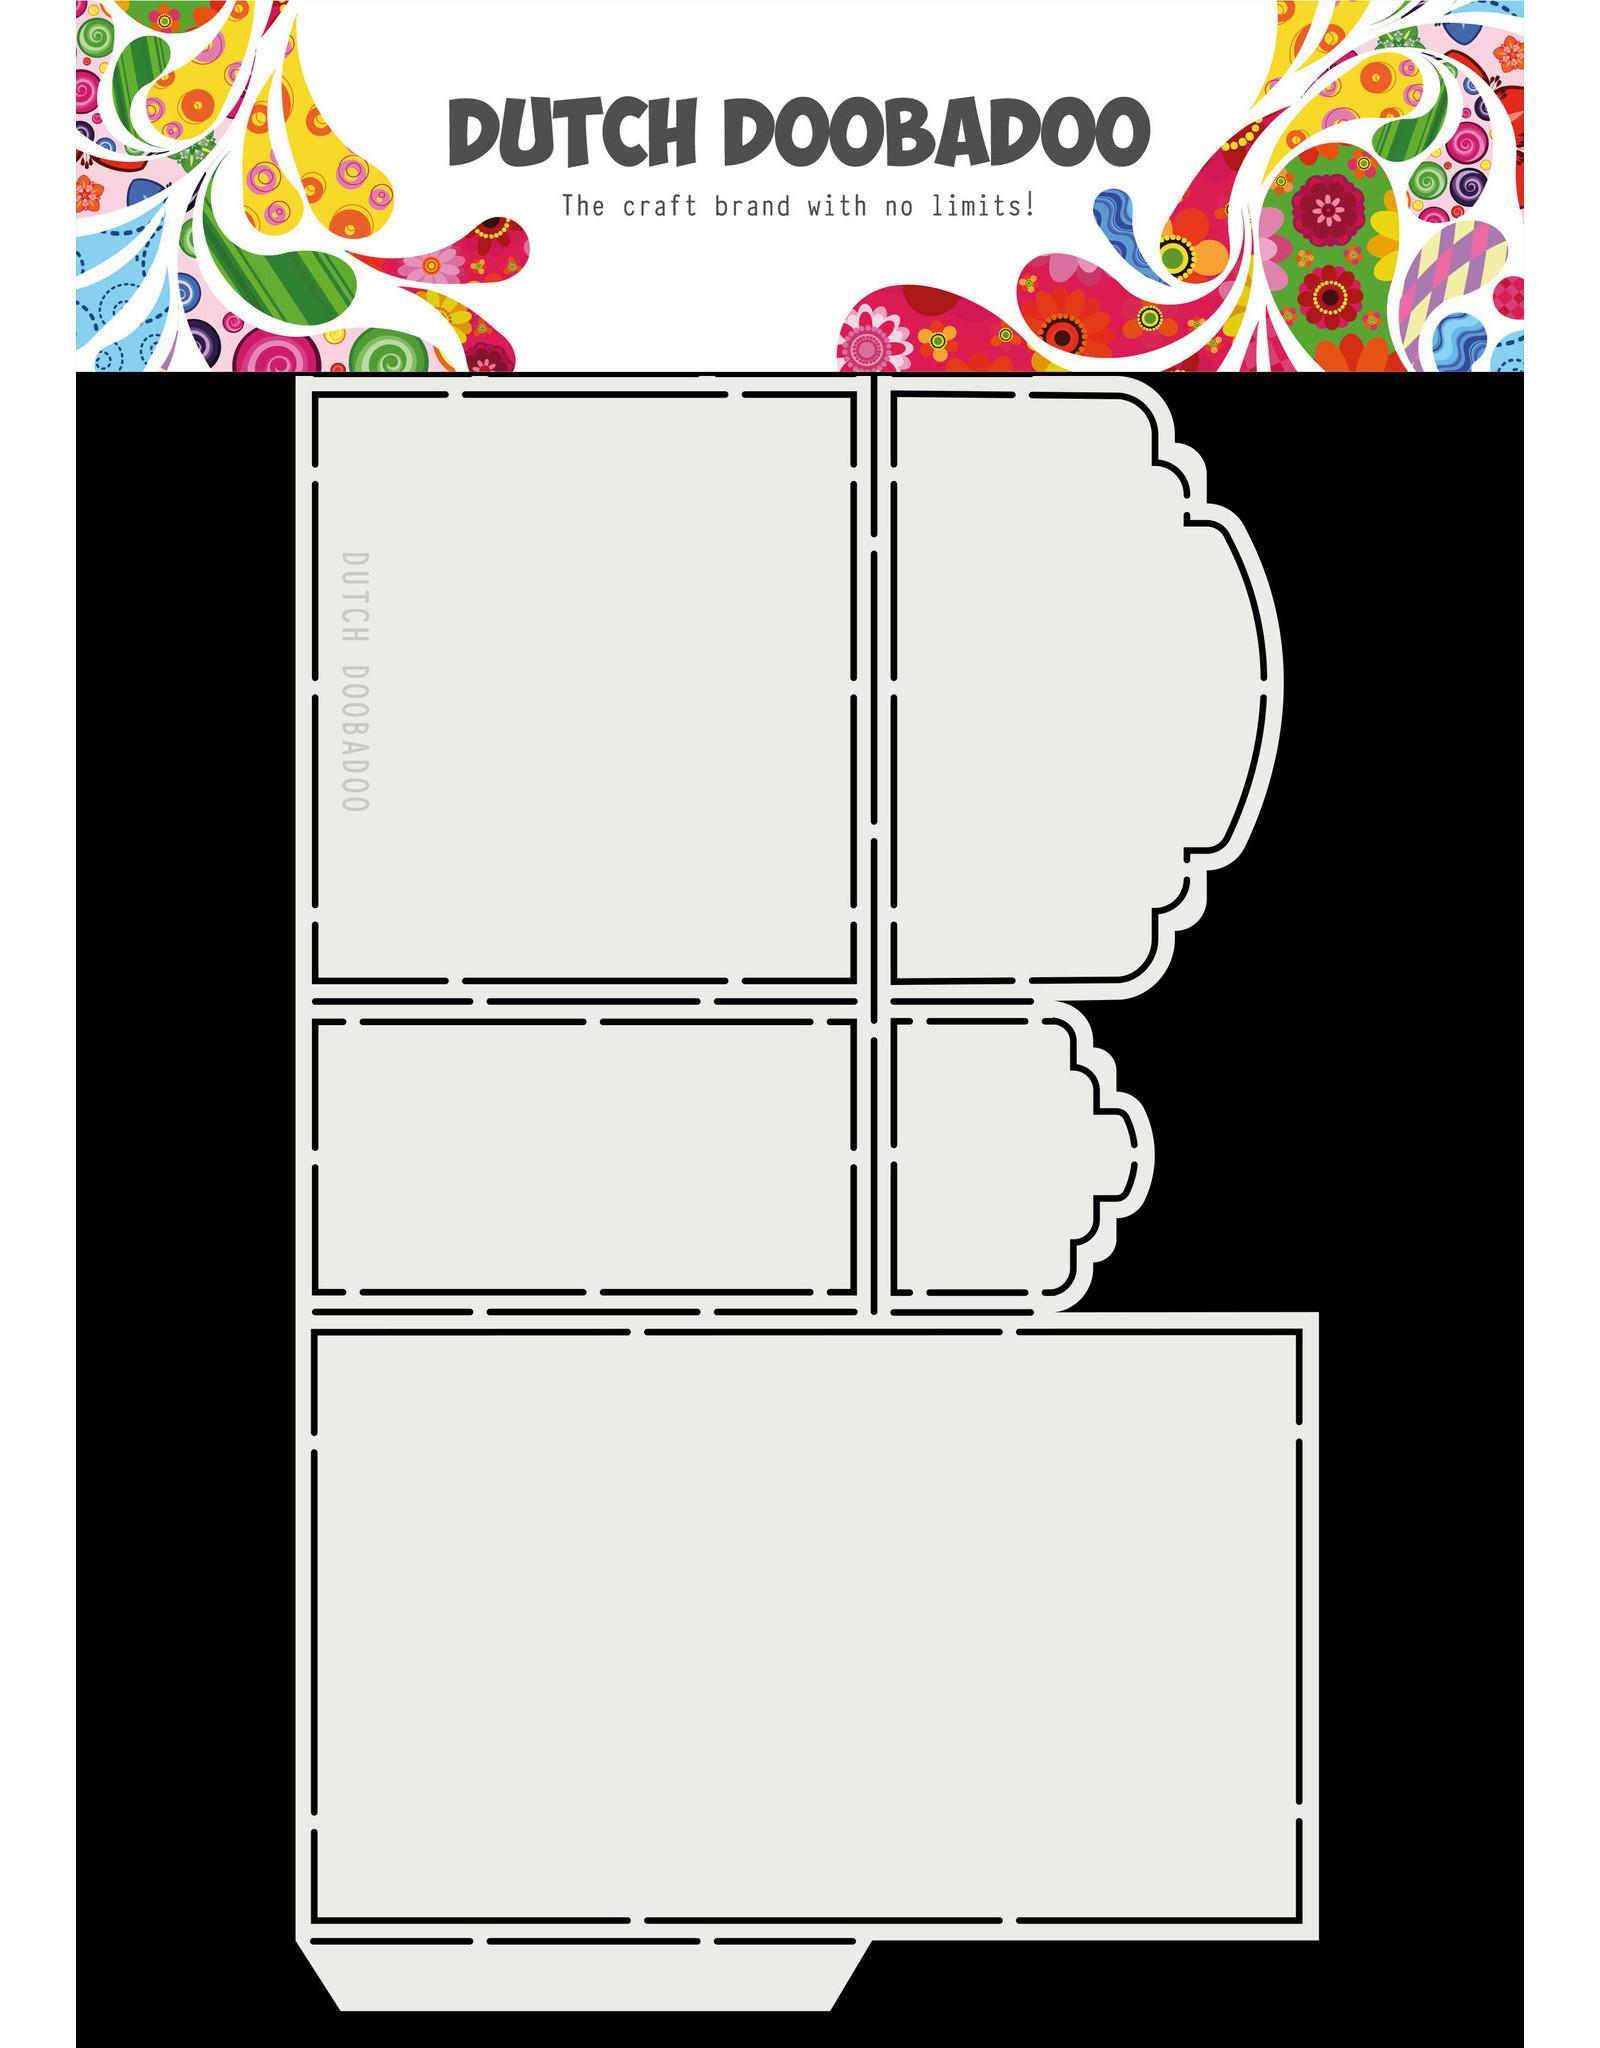 Dutch Doobadoo DDBD Dutch Box Art Pop-up box A4